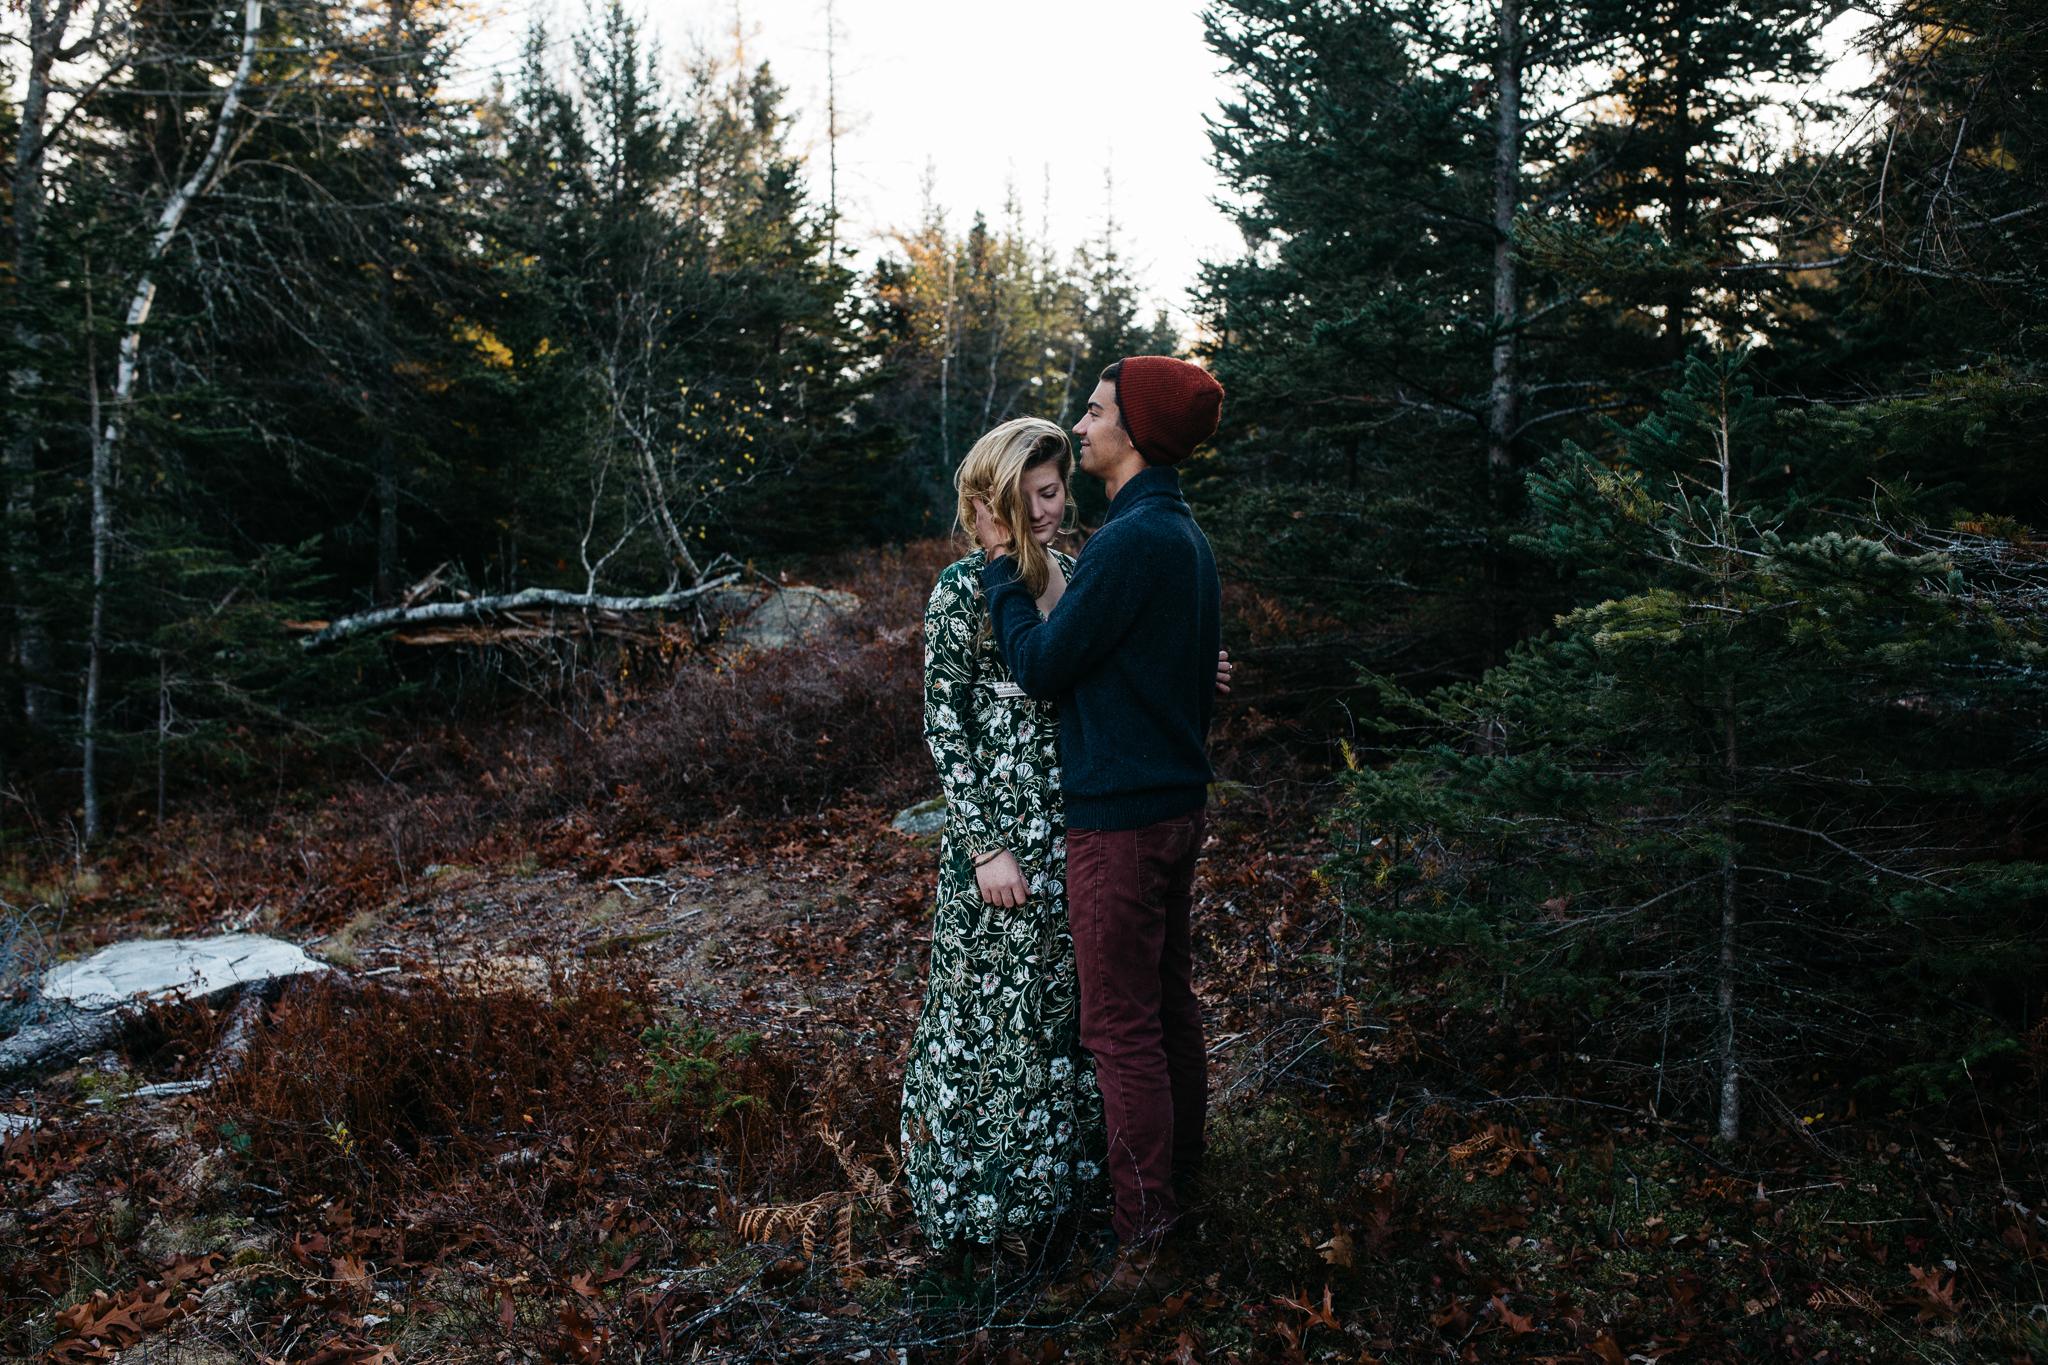 erinwheatcororyaylen-0559 Acadia National Park Lovers